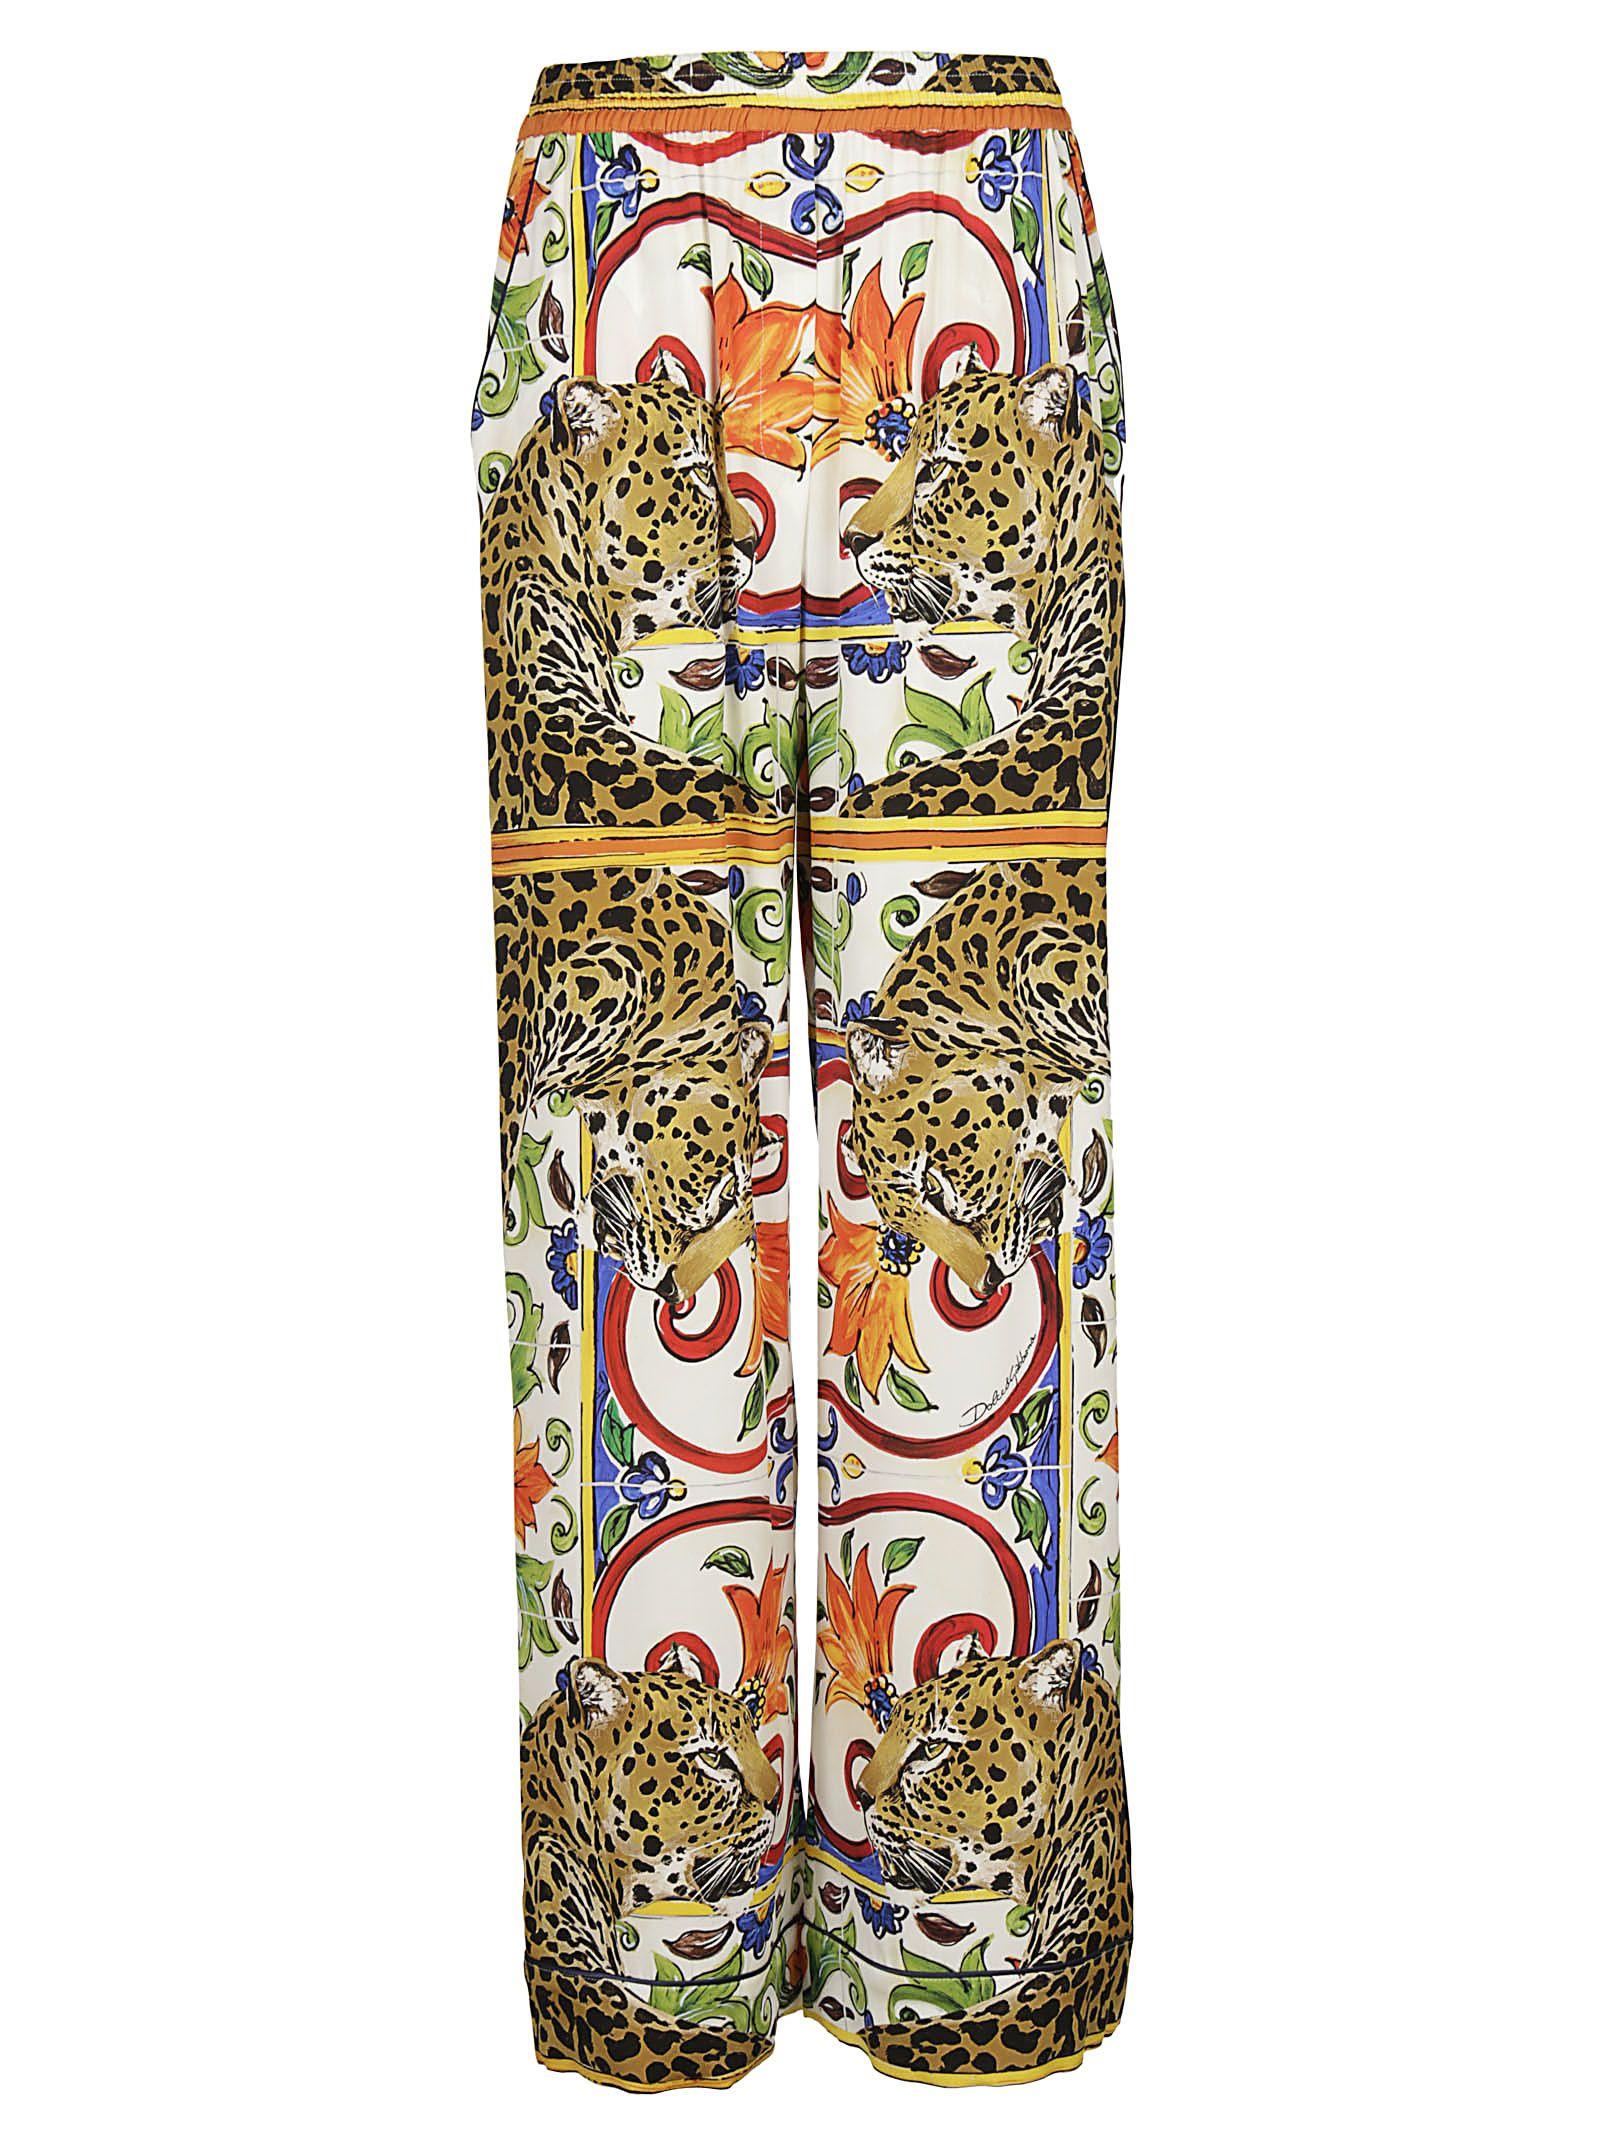 Dolce & Gabbana Leopard Print Palazzo Trousers